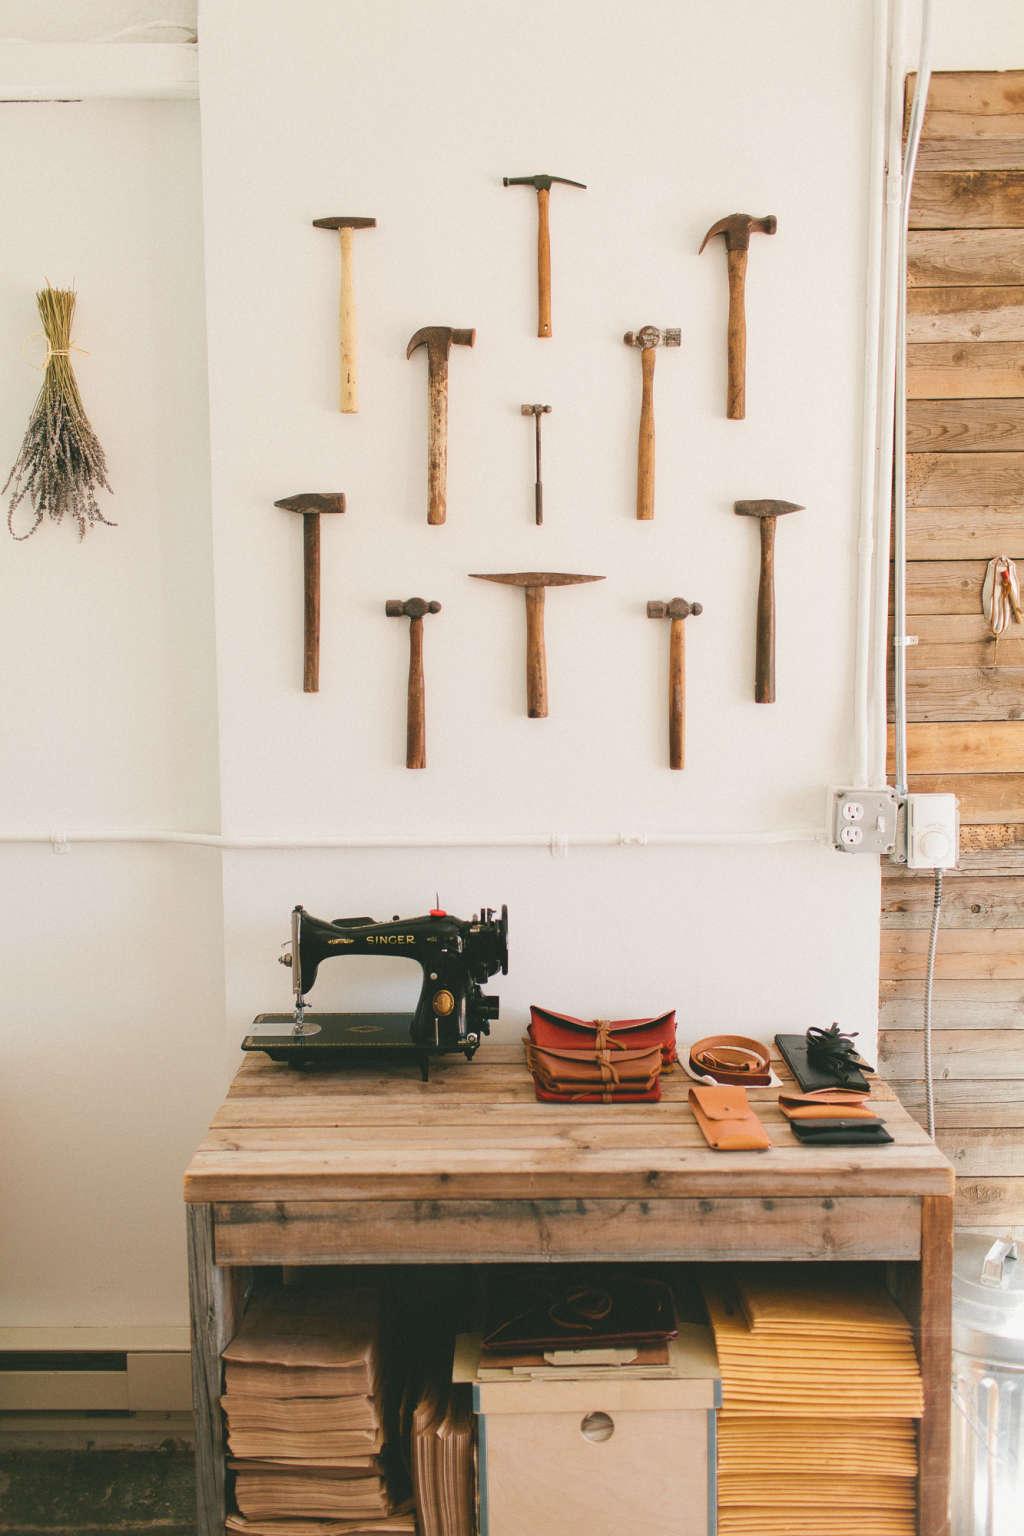 Meditations on the Joy of Craft